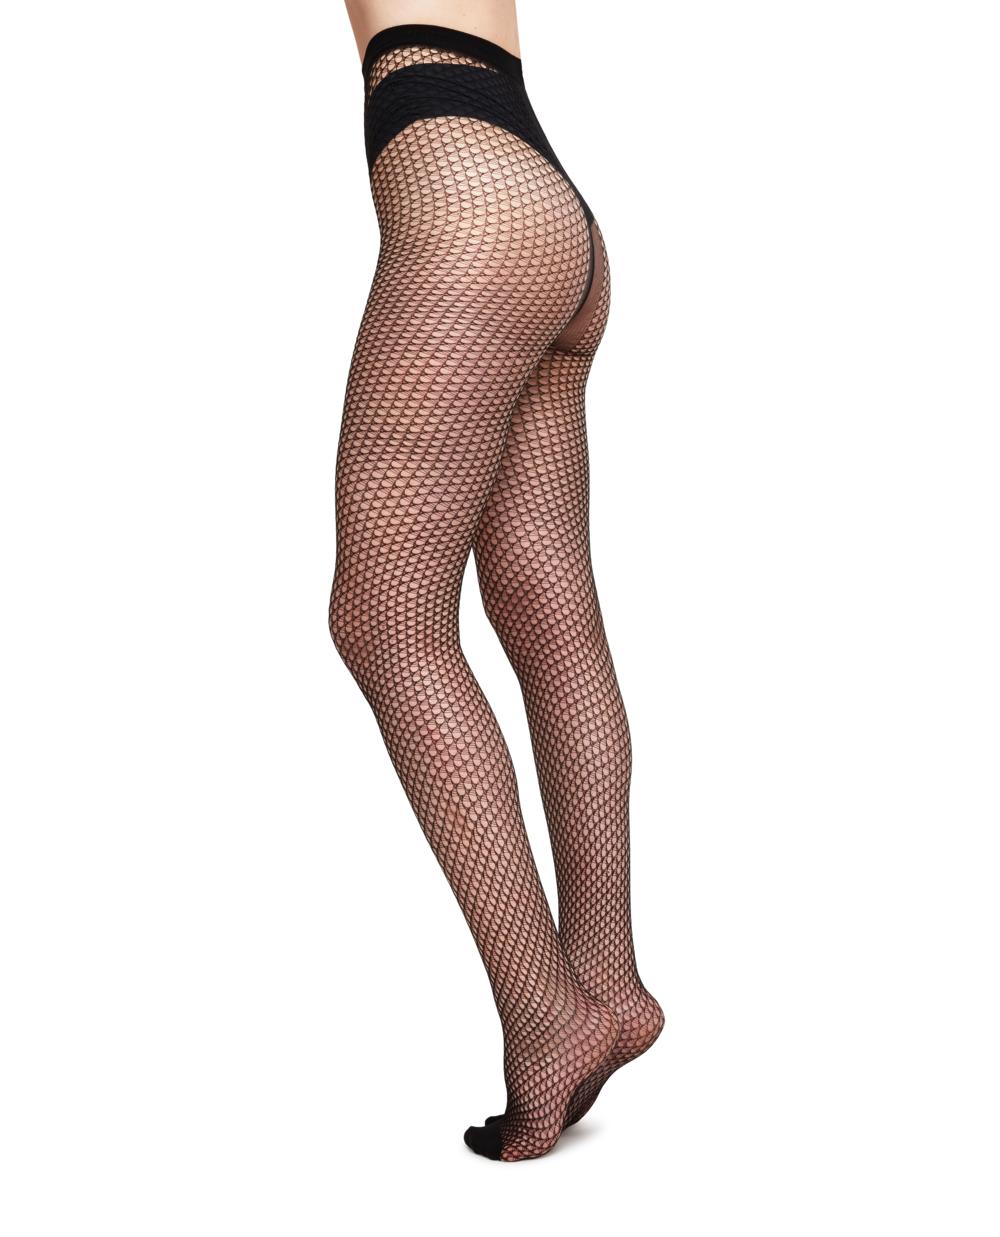 Swedish Stockings Vera Net Tights - Black.png